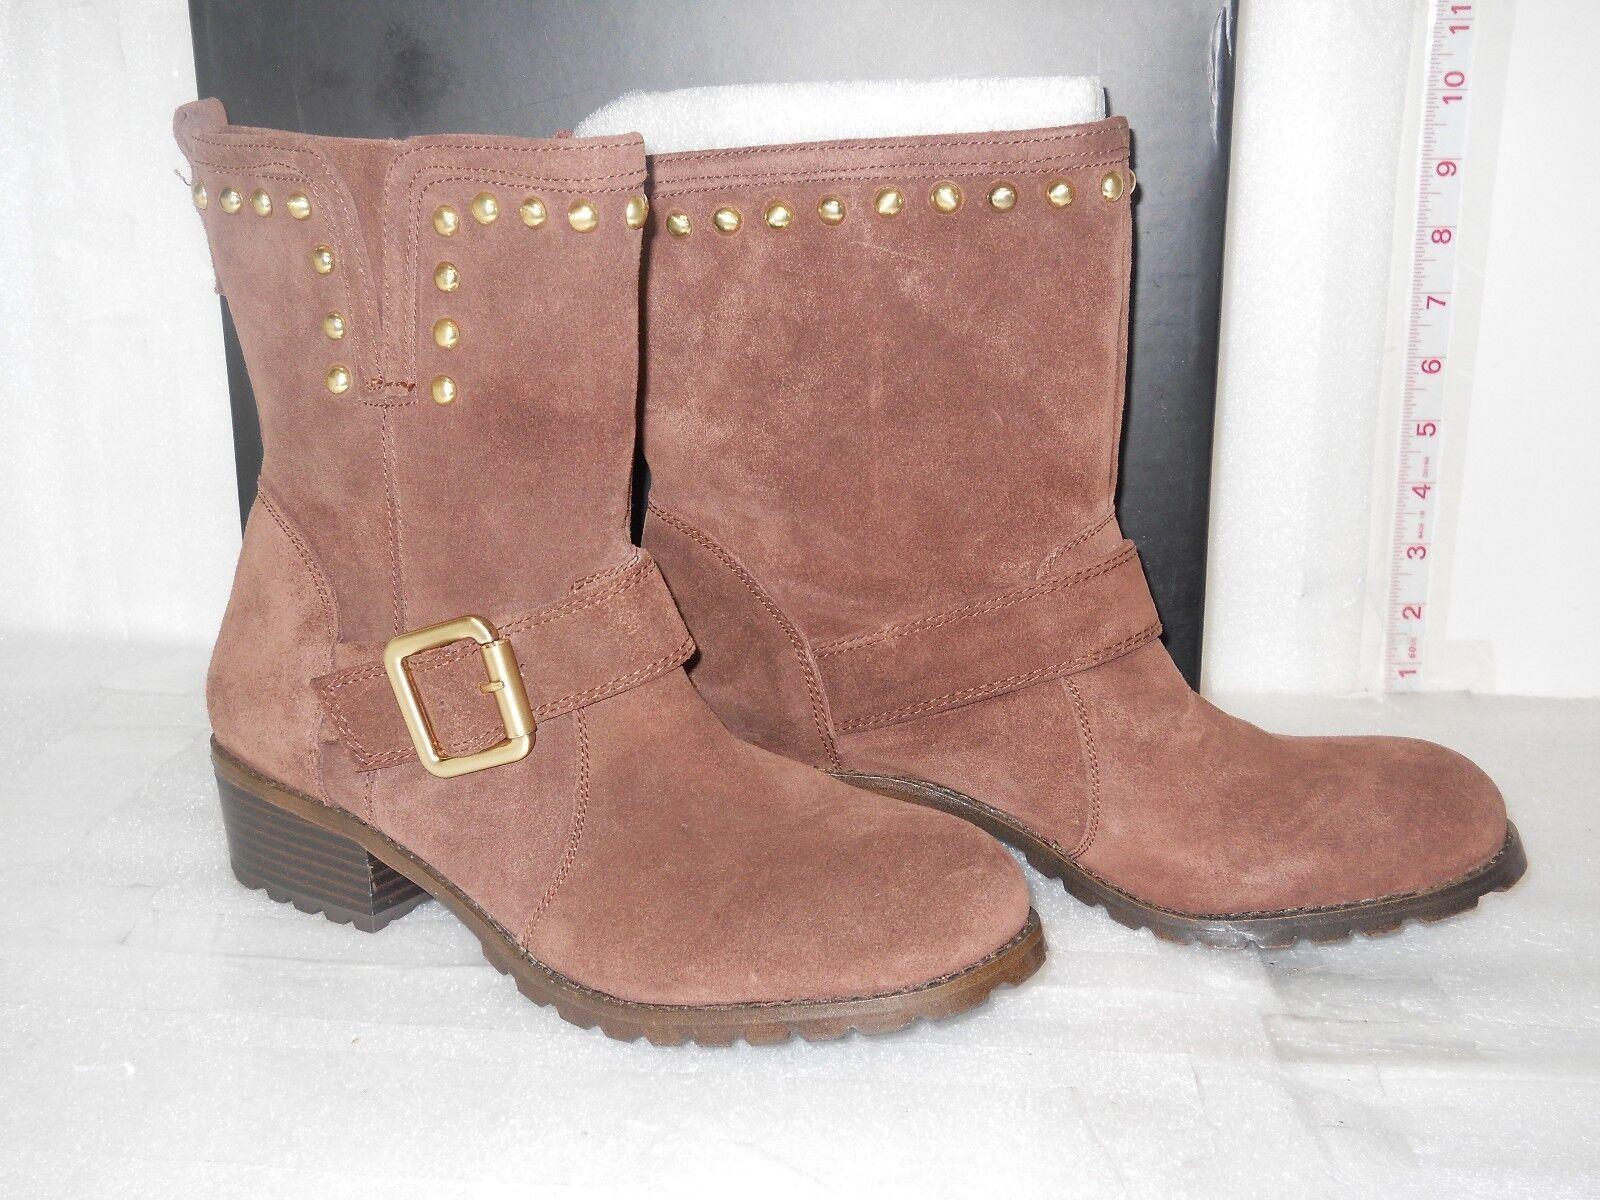 INC International Concepts Damenschuhe Henry Nutmeg Braun Fashion Stiefel 9 M Schuhes